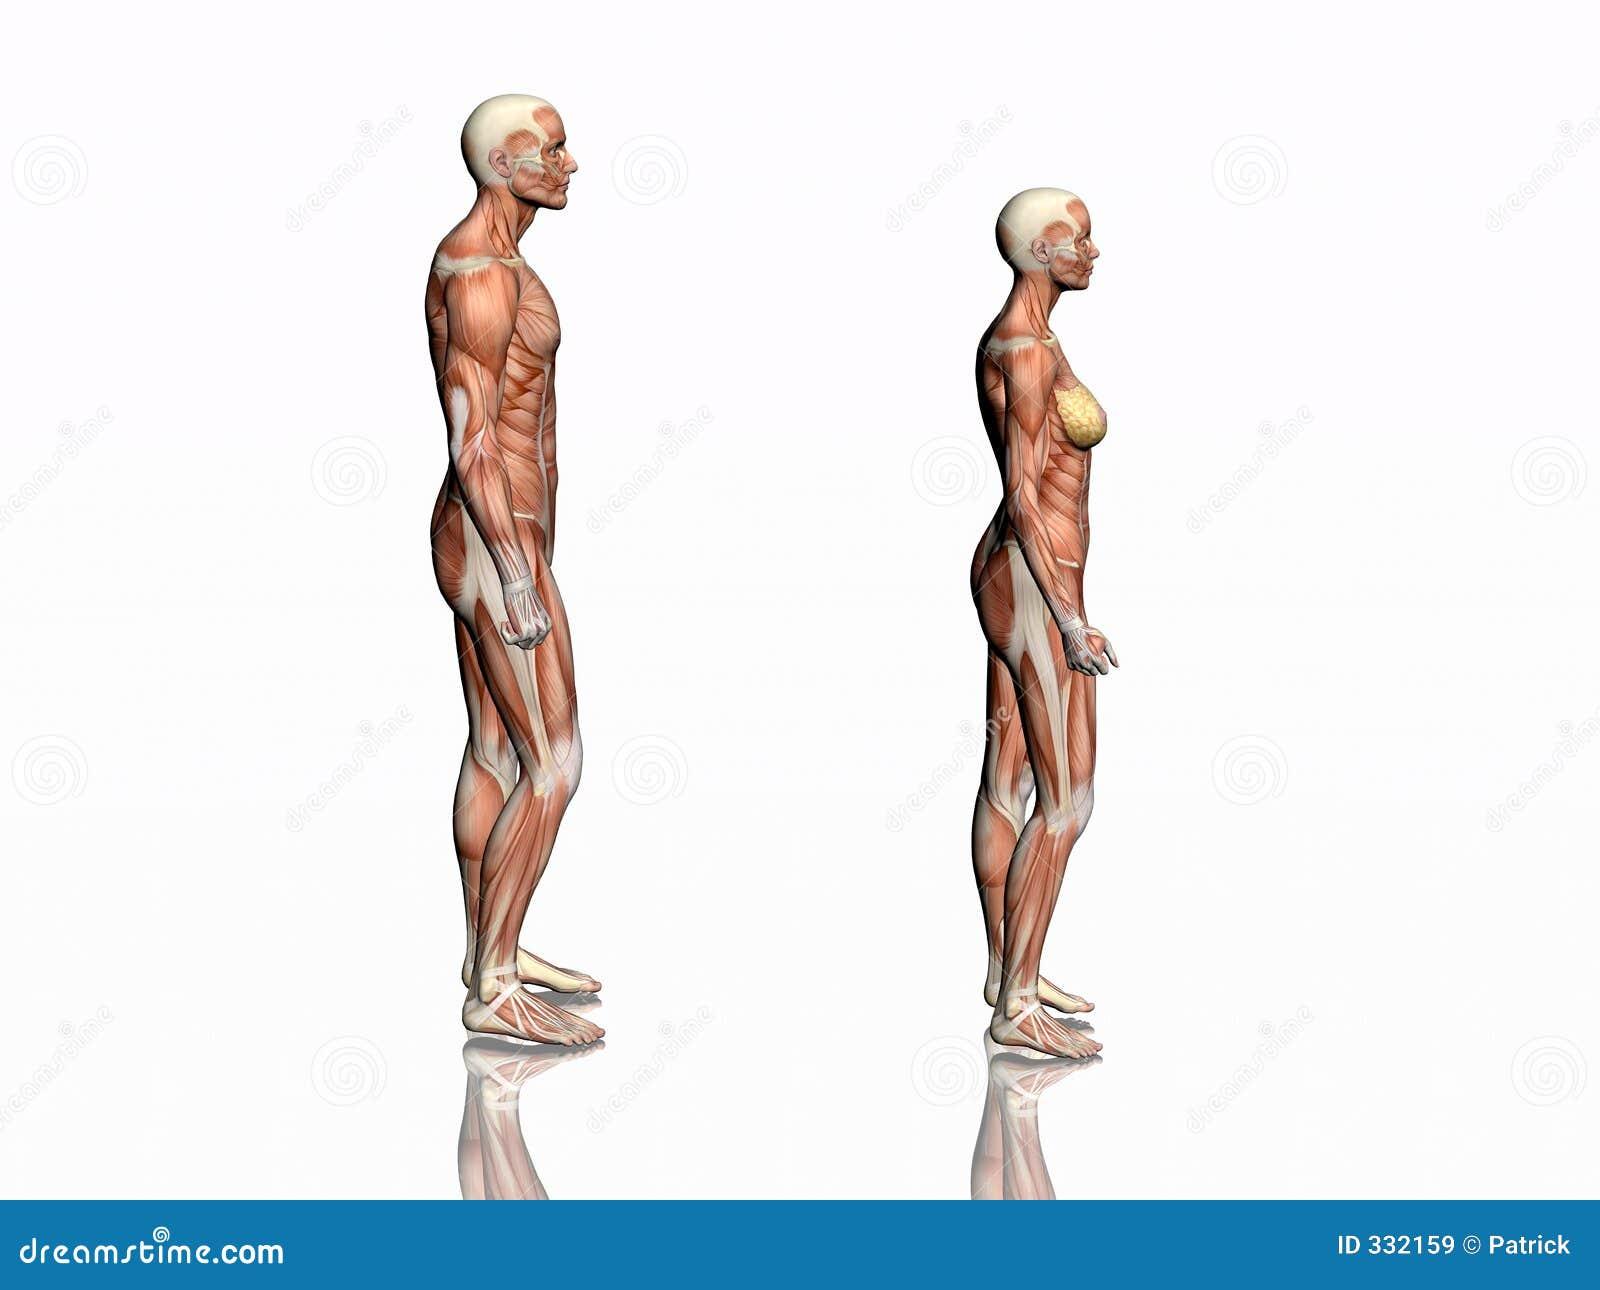 Anatomie De L Homme anatomie de l'homme et de femme. illustration stock - illustration